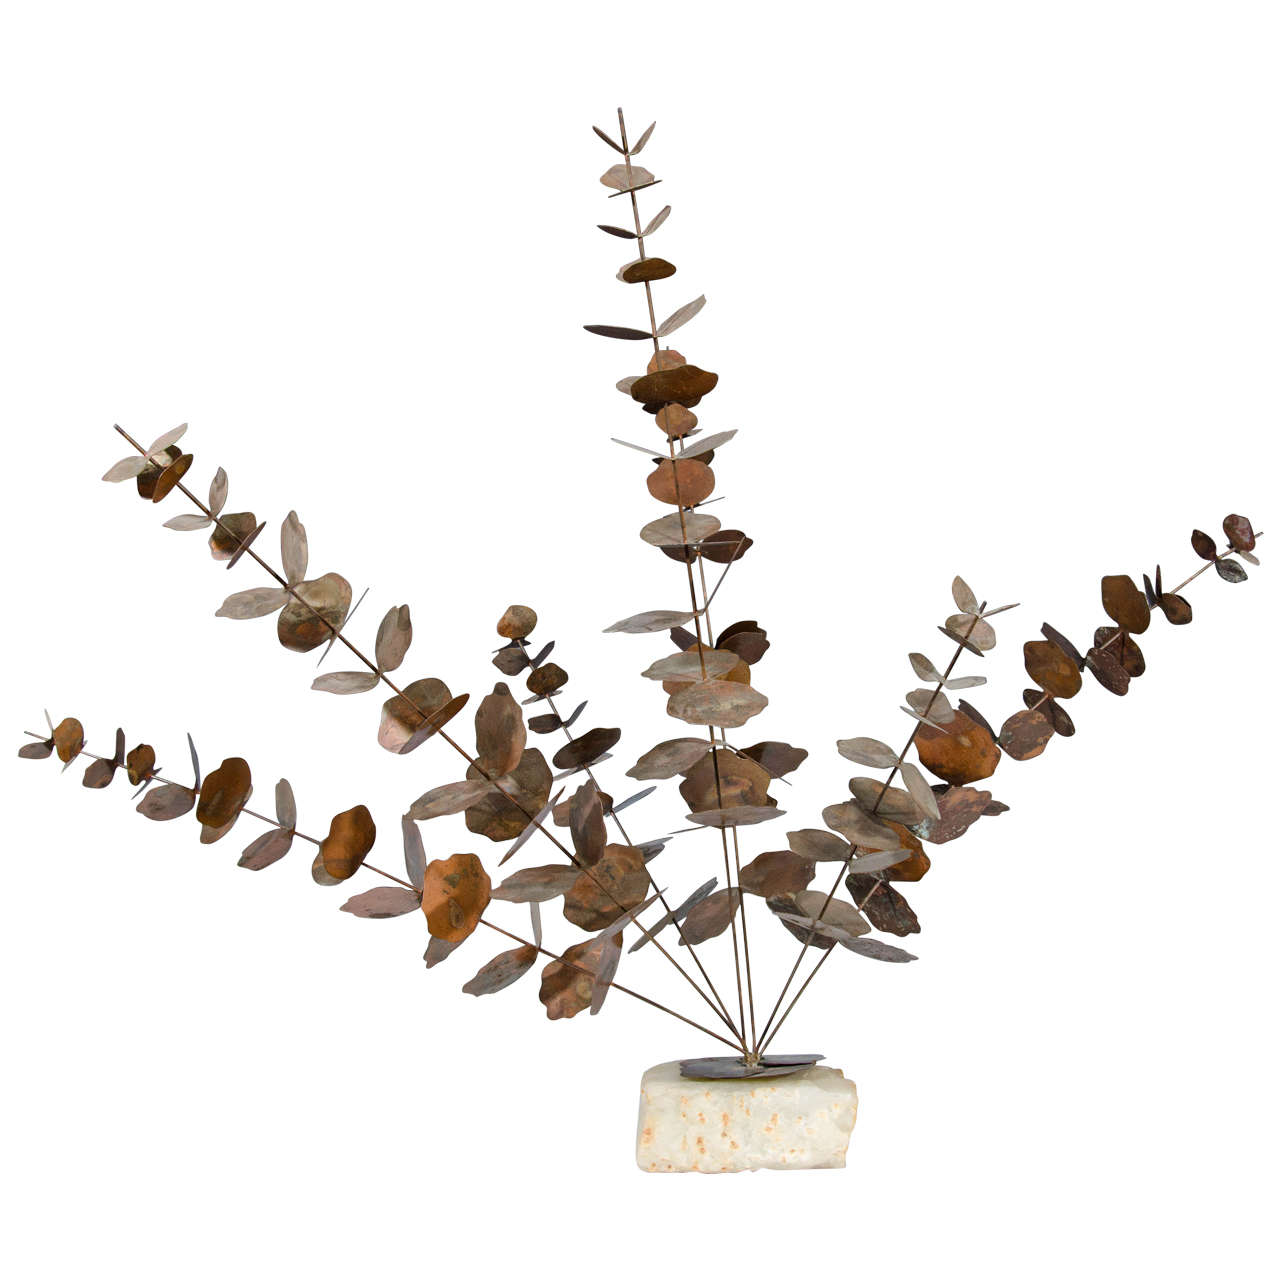 Midcentury Sculpture of a Eucalyptus Tree